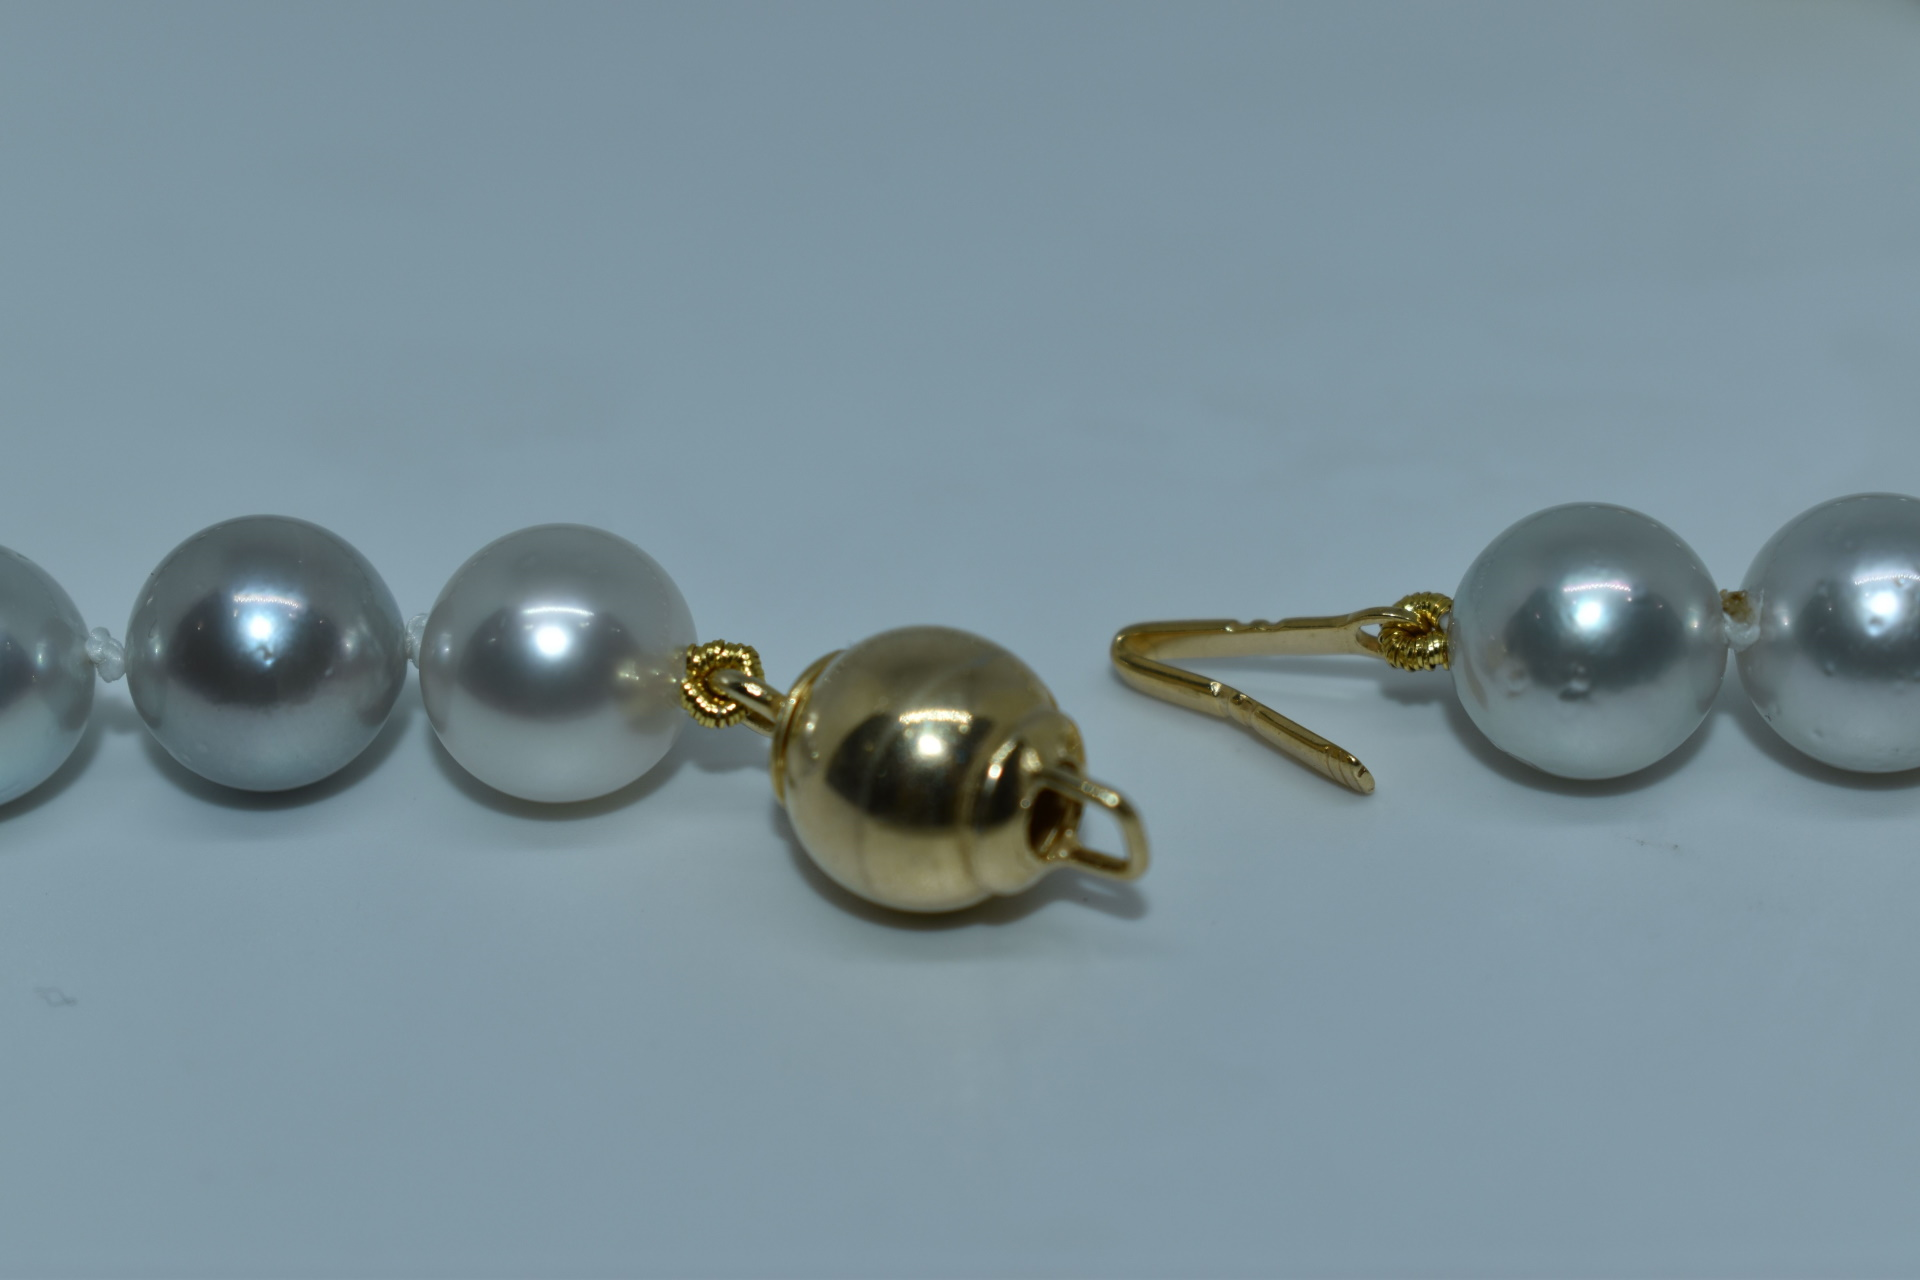 GEMSMU1155216 COLLANA DONNA 39 PERLE NATURALI MULTICOLORE 4 1stAmerican jewerly collana 39 perle naturali multicolore Ø9x118mm con chiusura in argento ag925